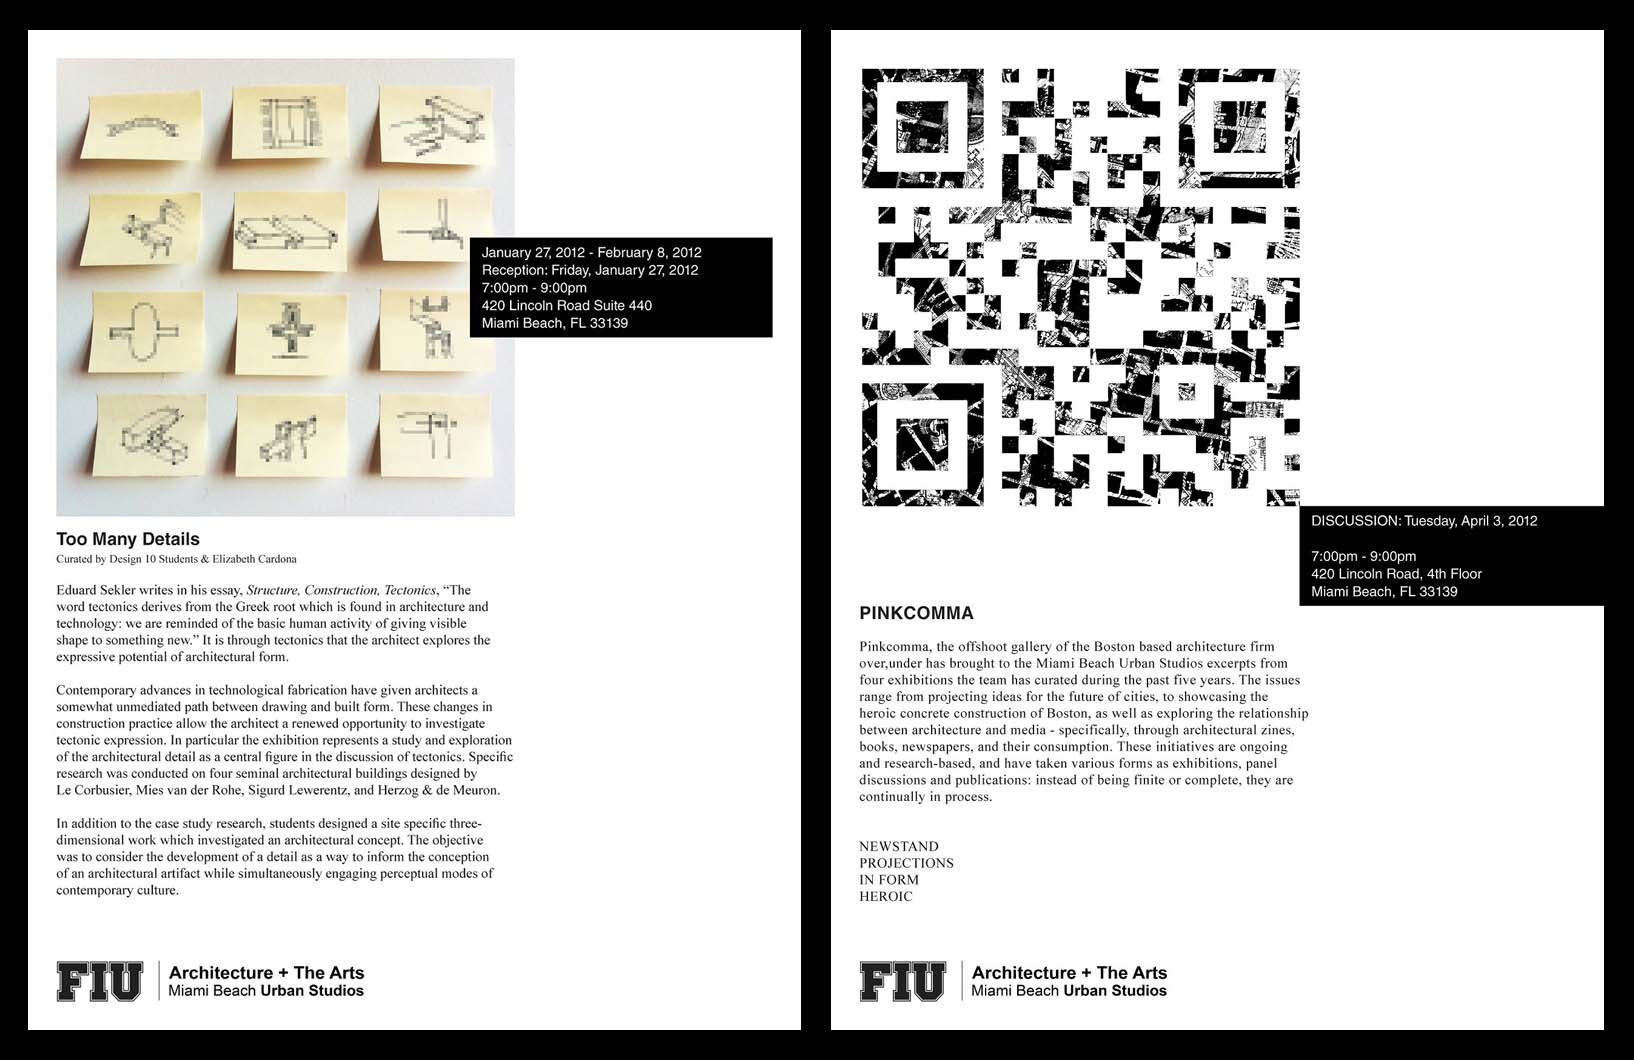 02_MBUS Exhibition Poster_Design 10.jpg